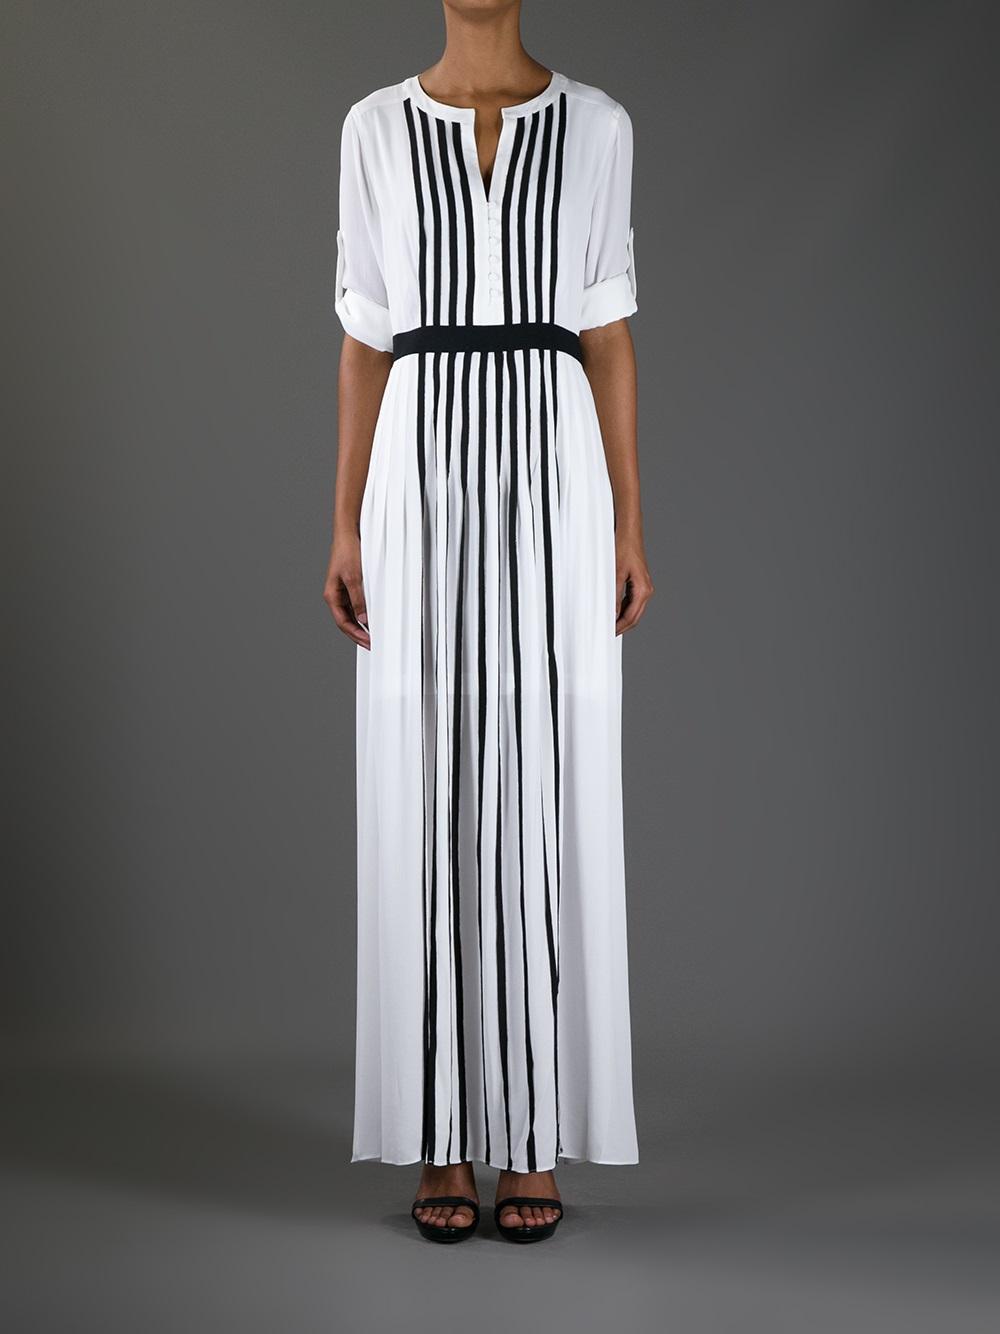 Lyst Bcbgmaxazria Striped Long Dress In White